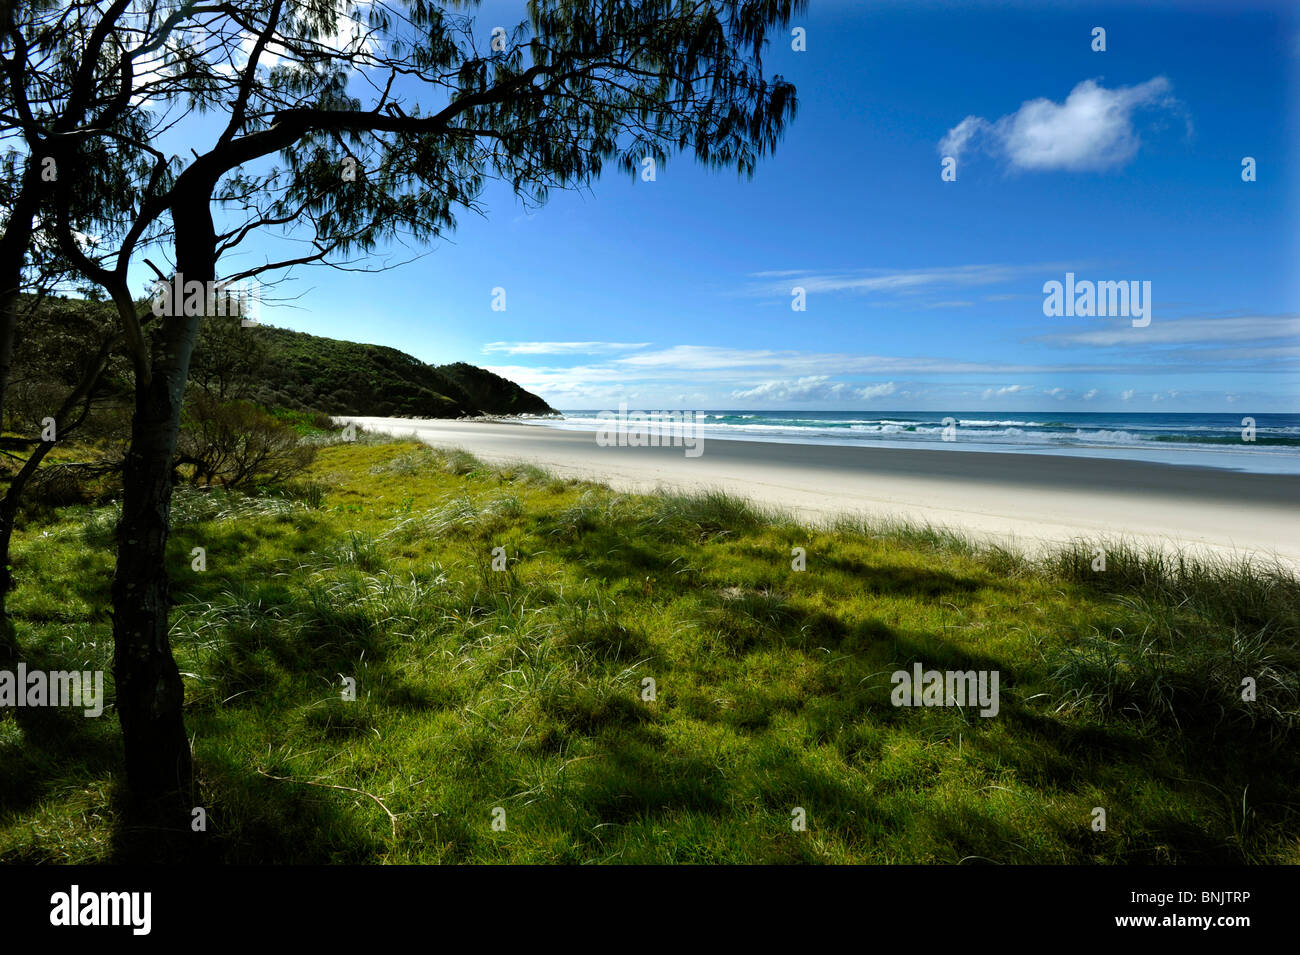 North end of Seven Mile Beach Lennox Head Northern NSW Australia - Stock Image